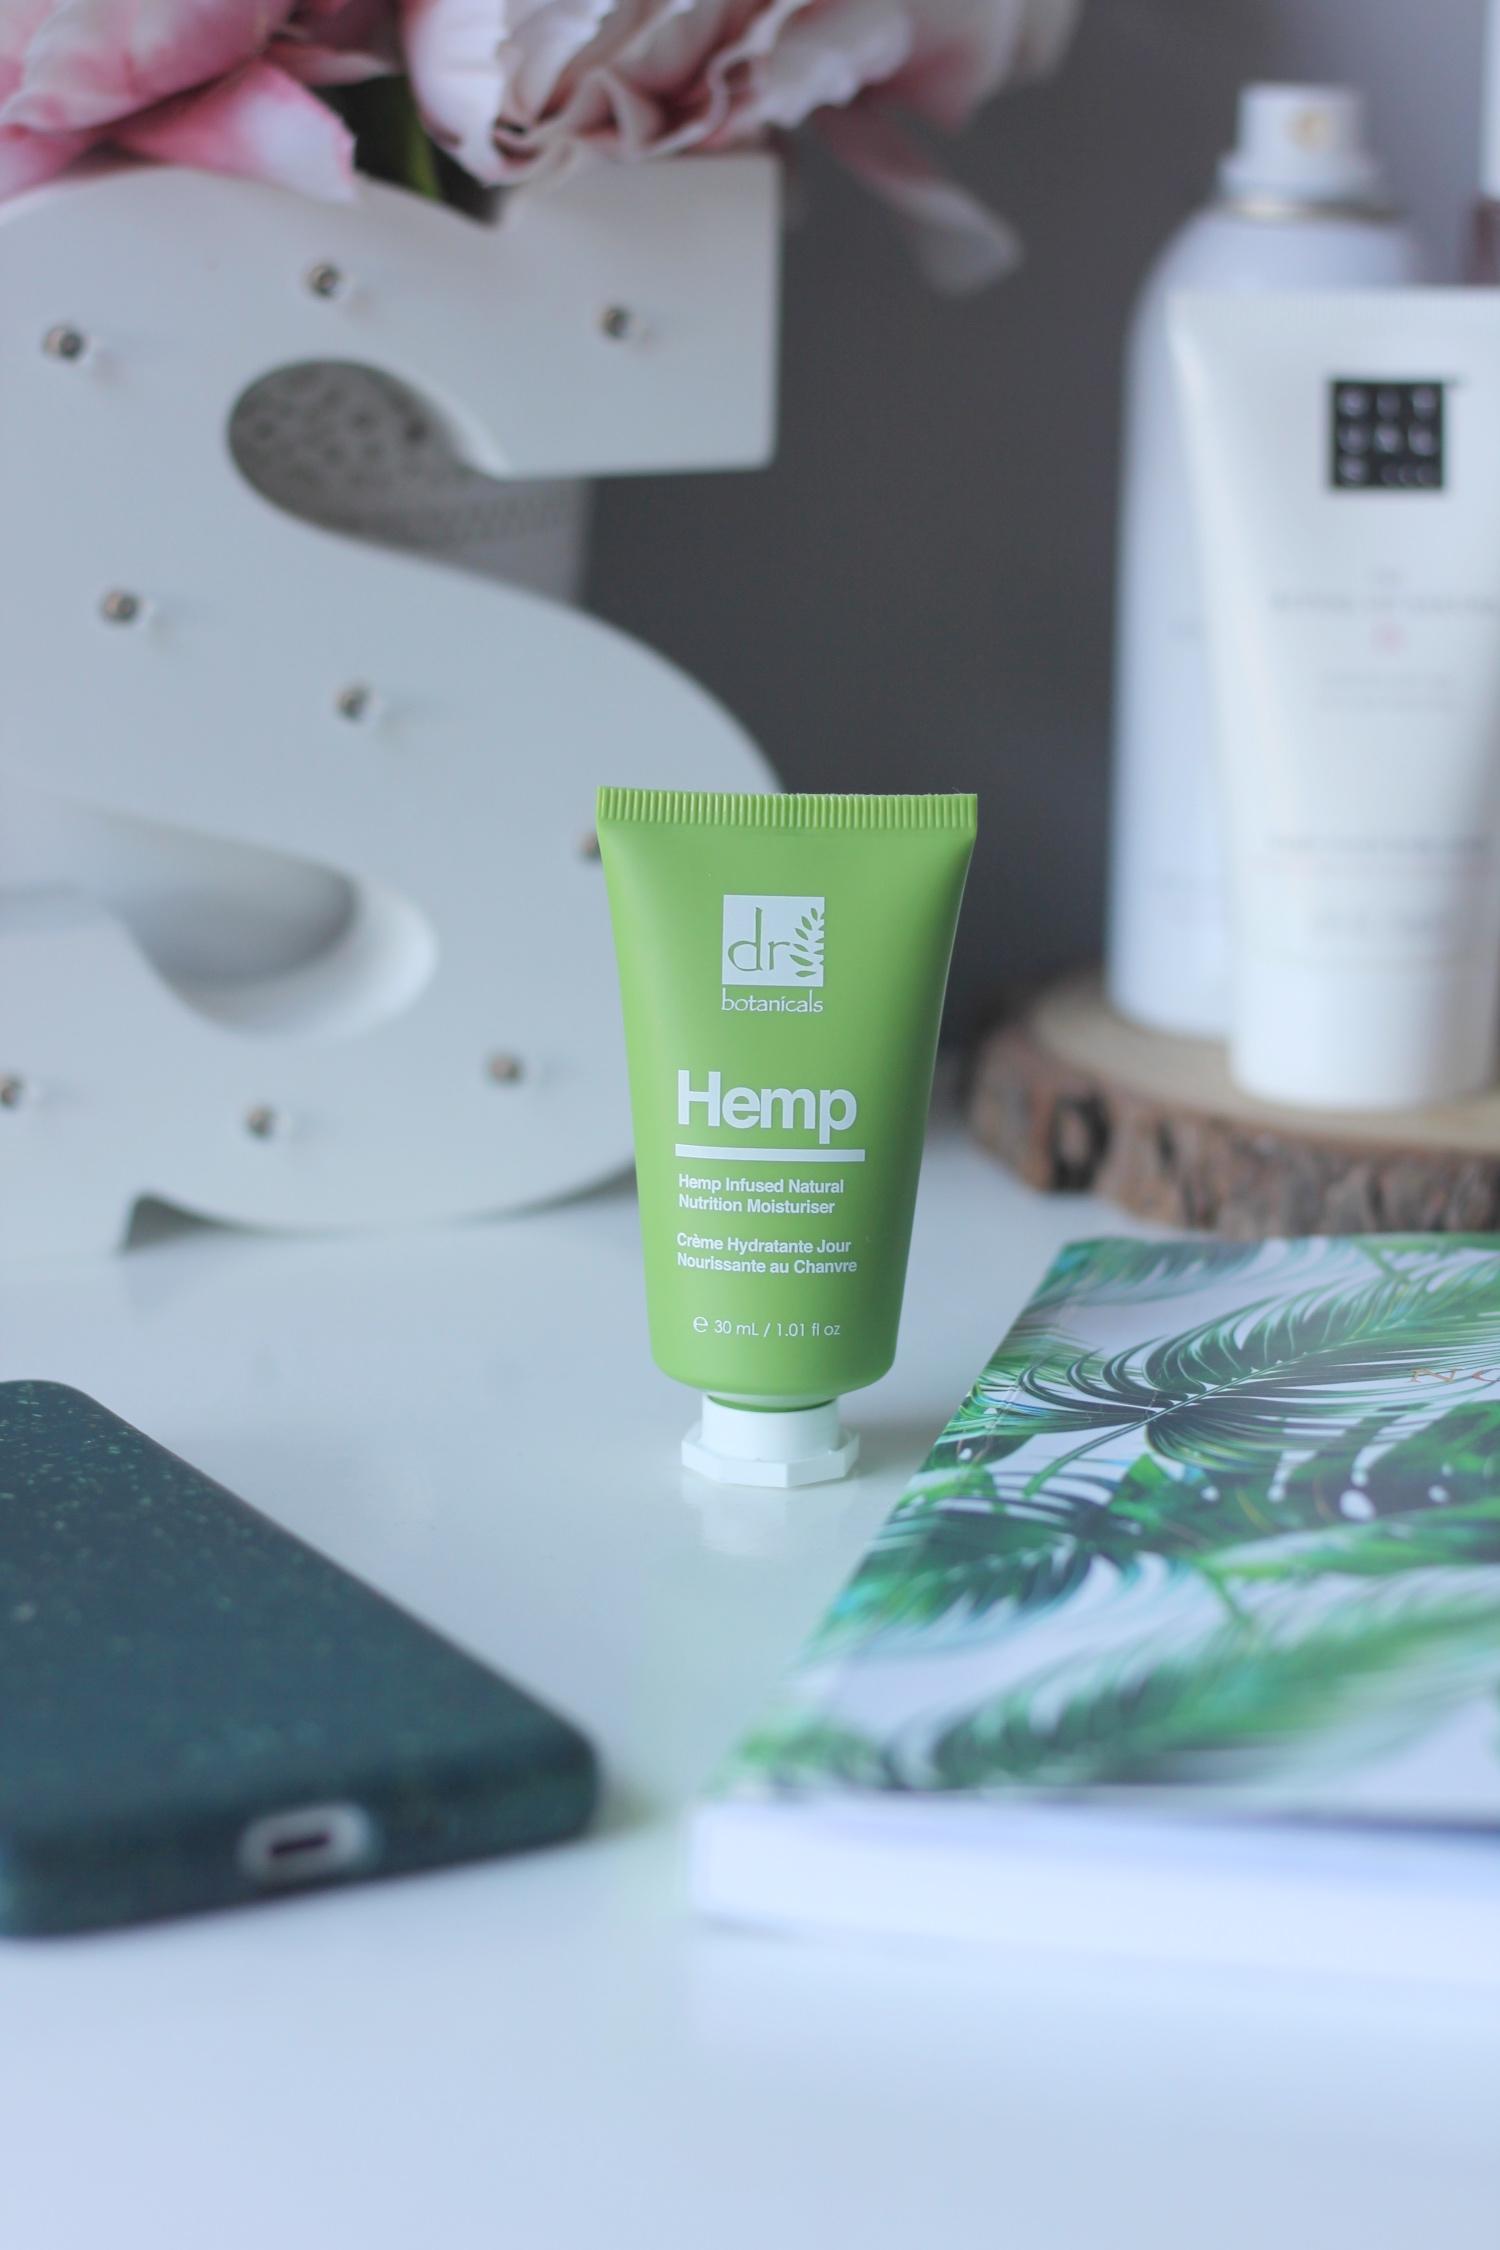 dr botanicals hemp moisturiser